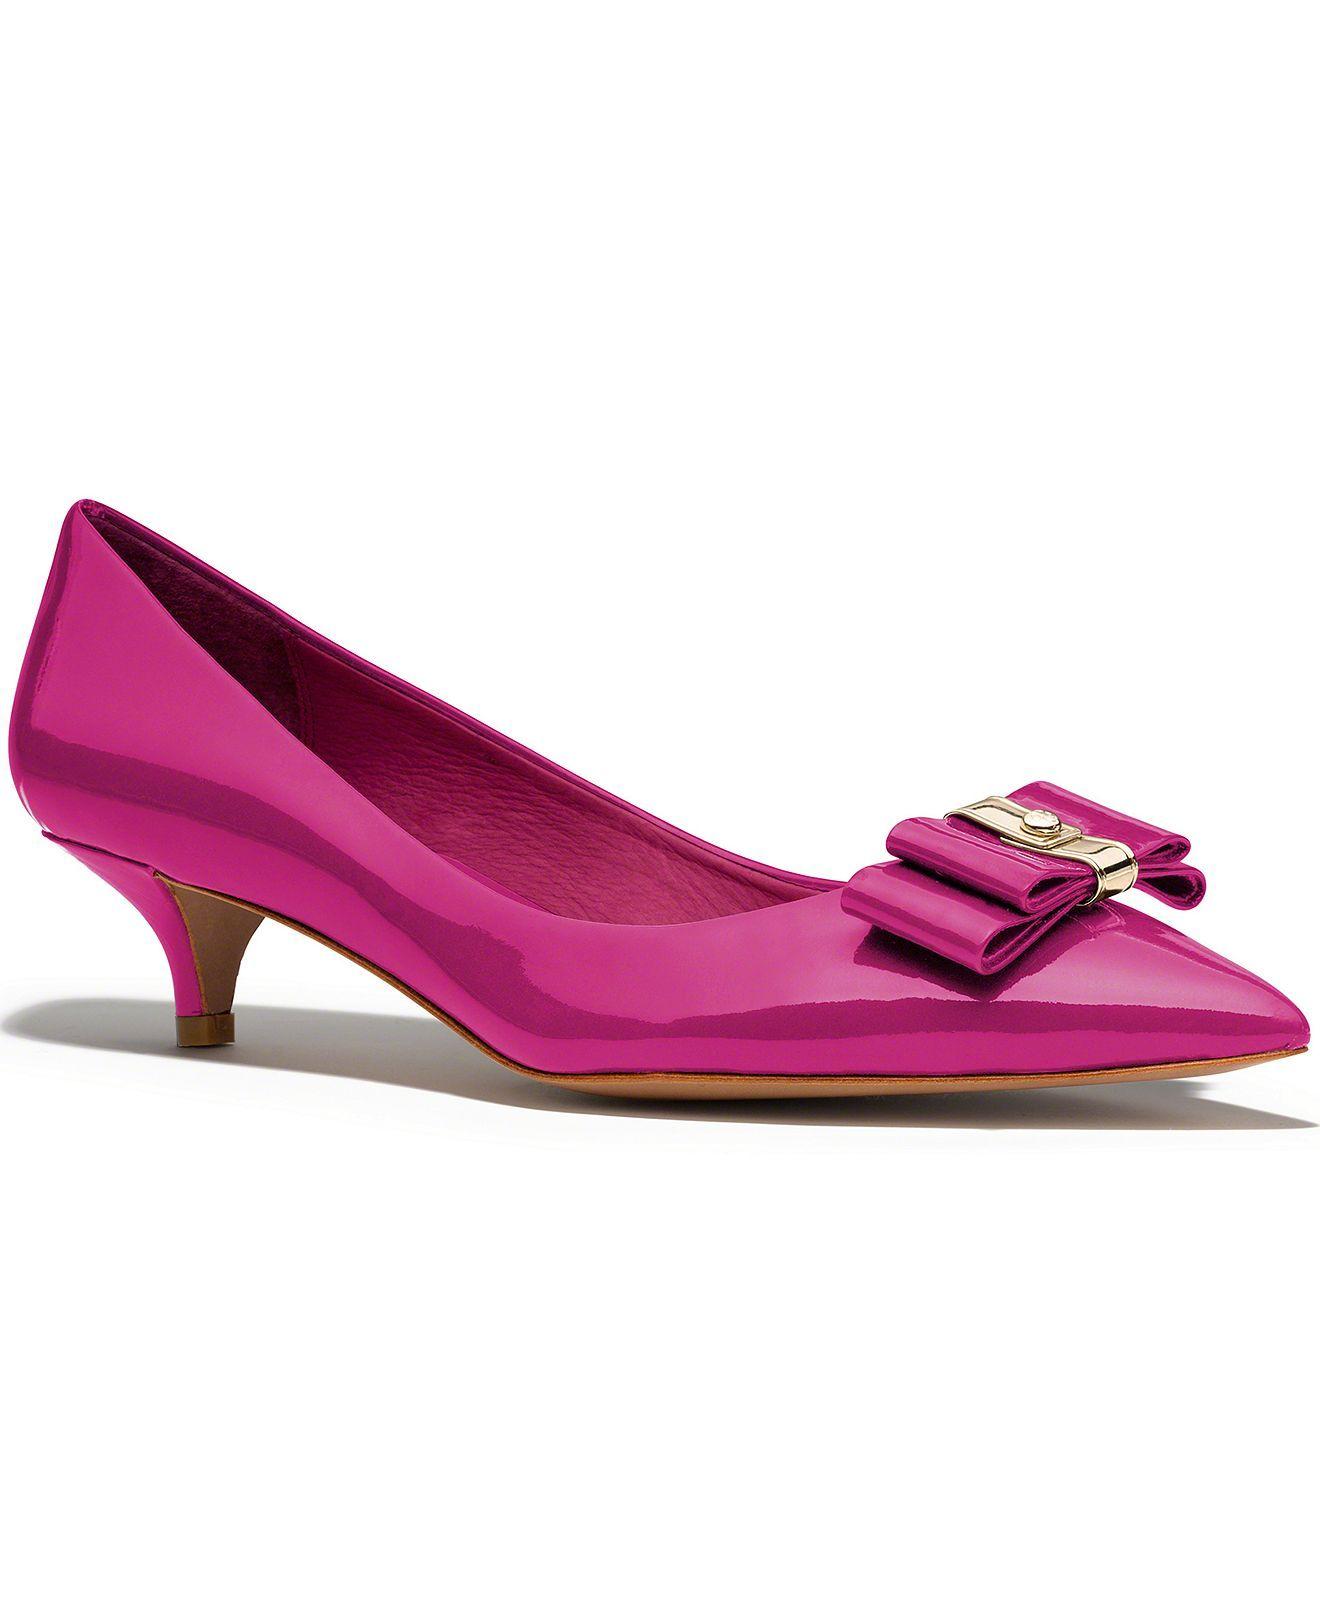 a3ca3a11406 COACH MANDY PUMP - Coach Shoes - Handbags   Accessories - Macy s ...